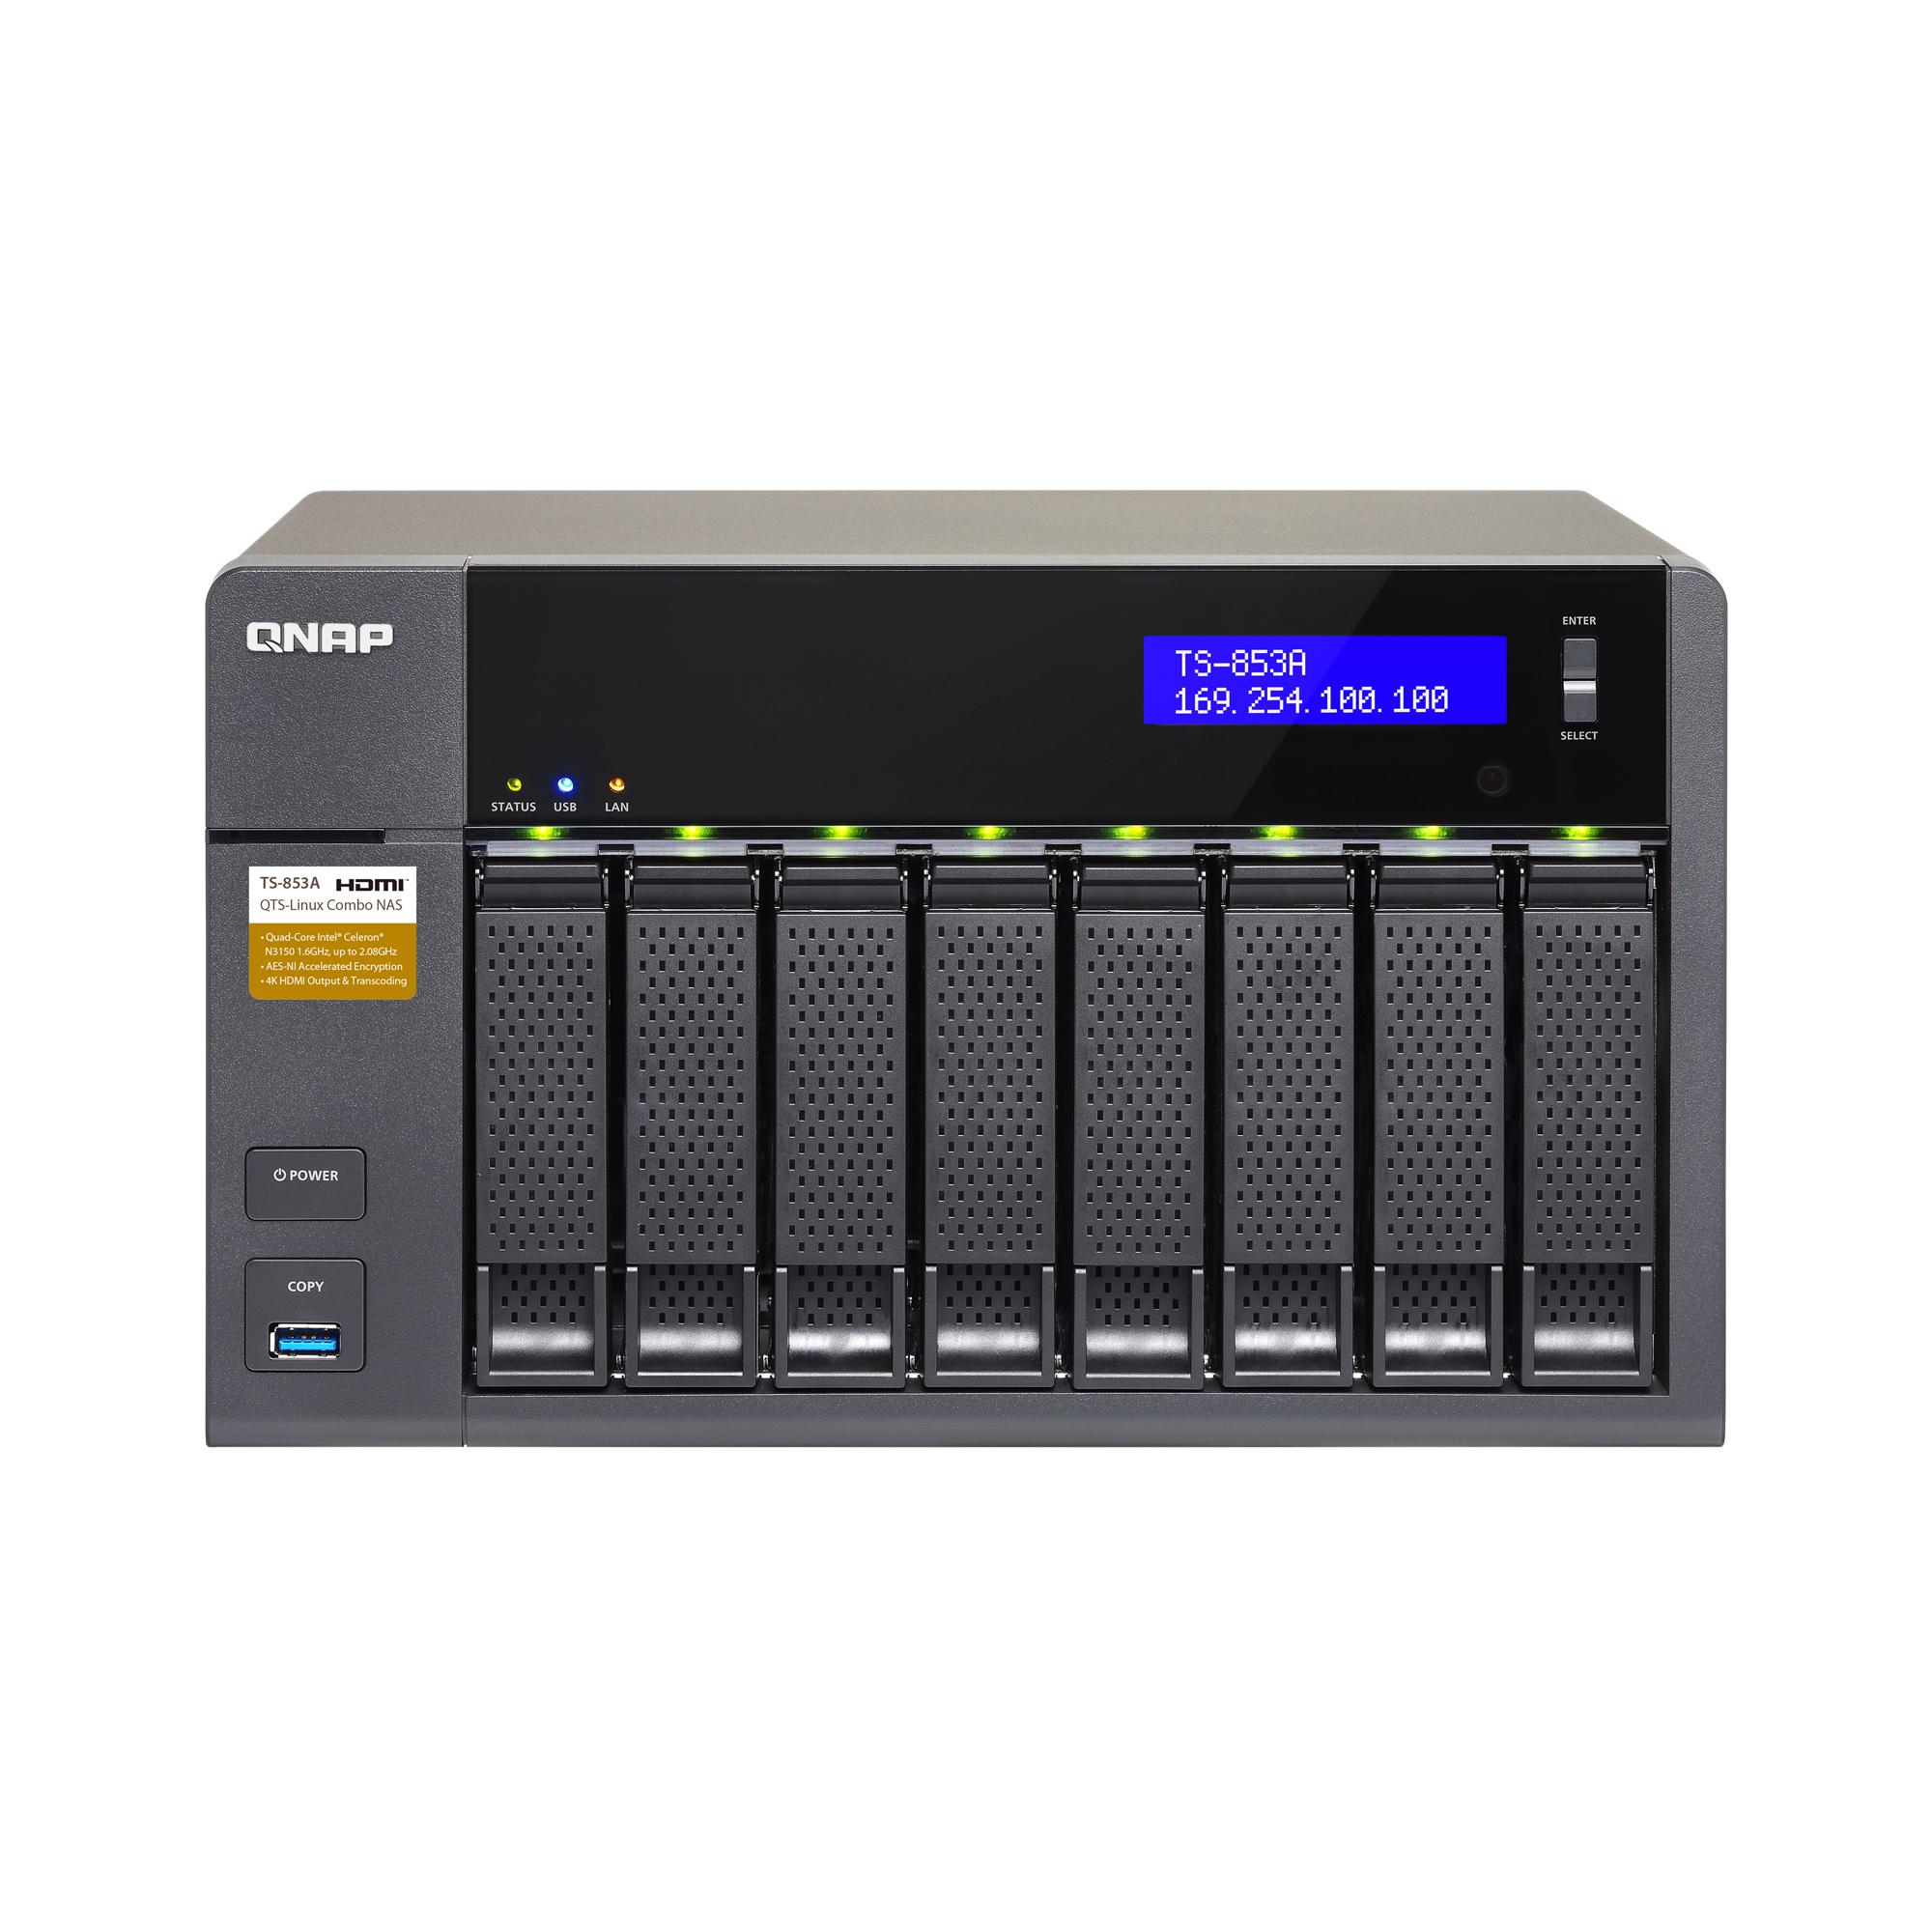 QNAP Systems TS-853A-4G NAS 8-Bay Leergehäuse 4x GbE LAN 4GB RAM bei NBB Notebooksbilliger Versandkostenfrei